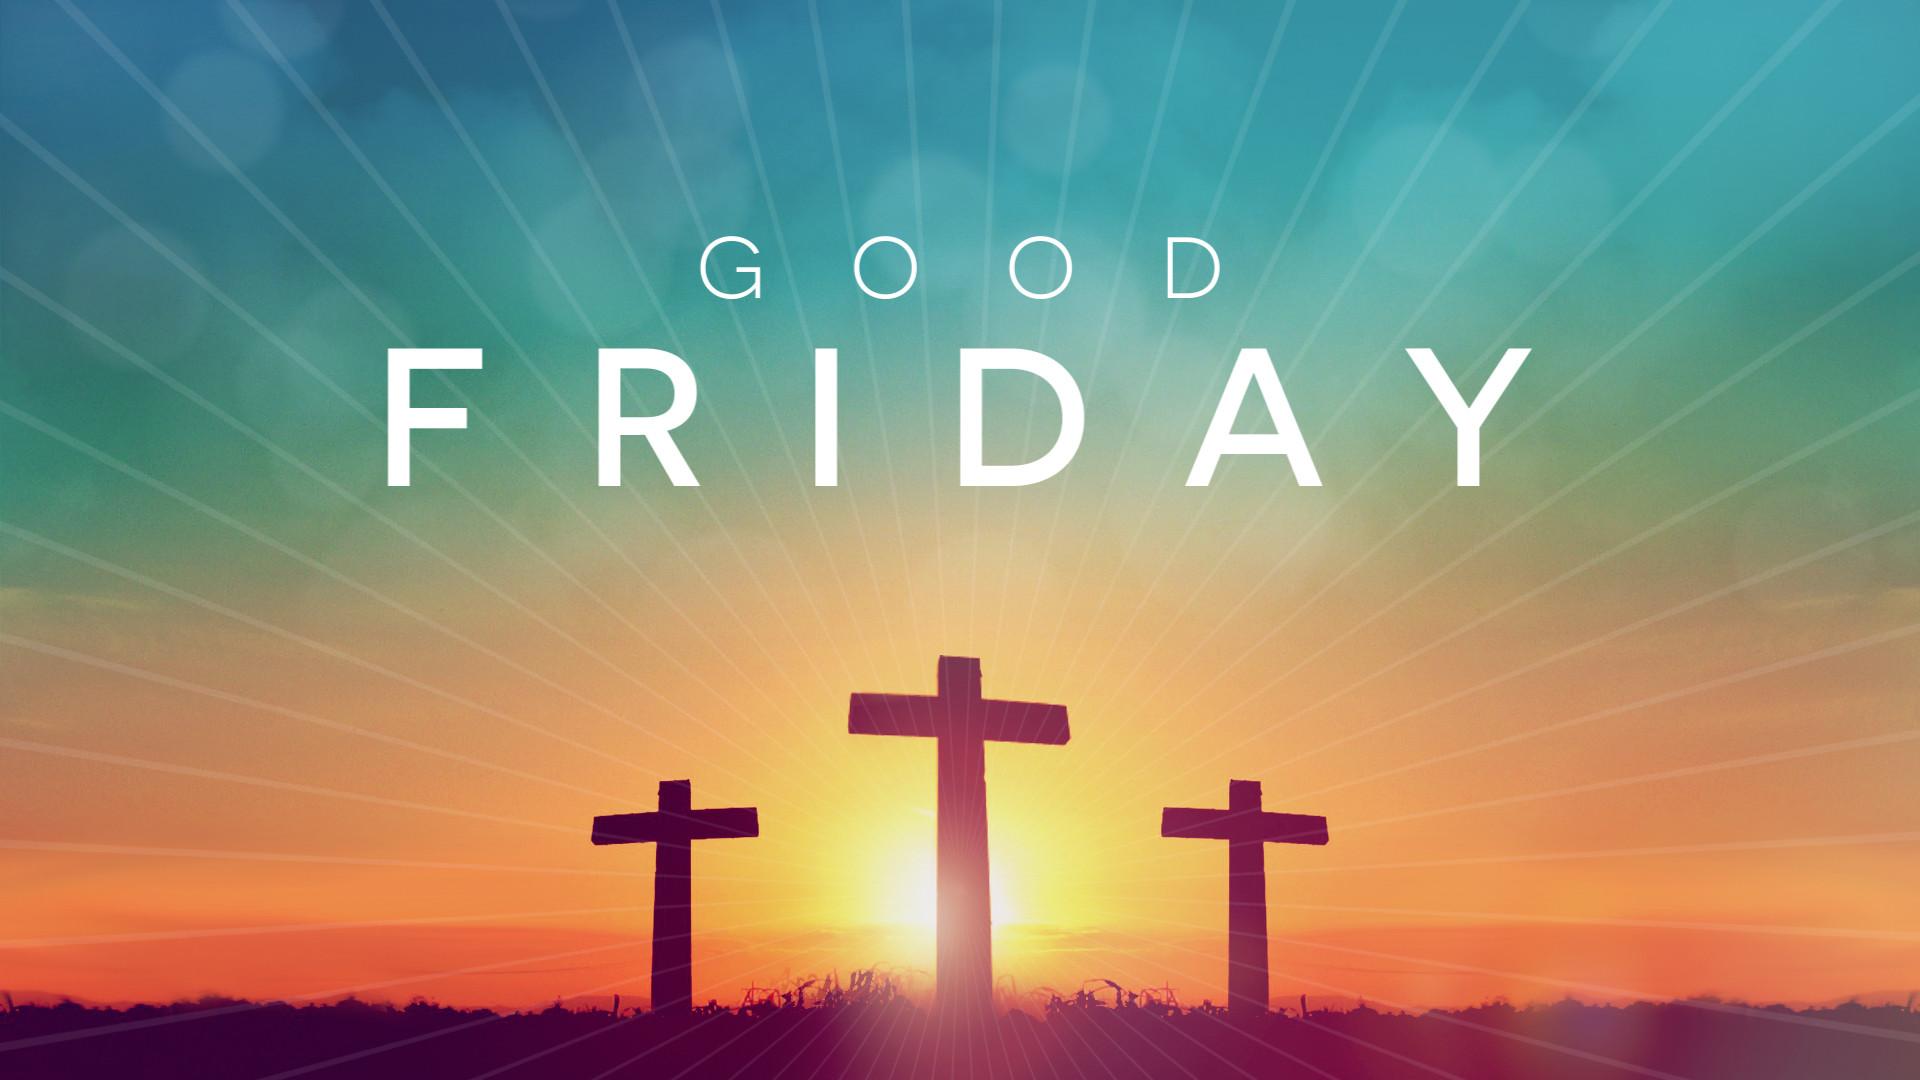 Good Friday